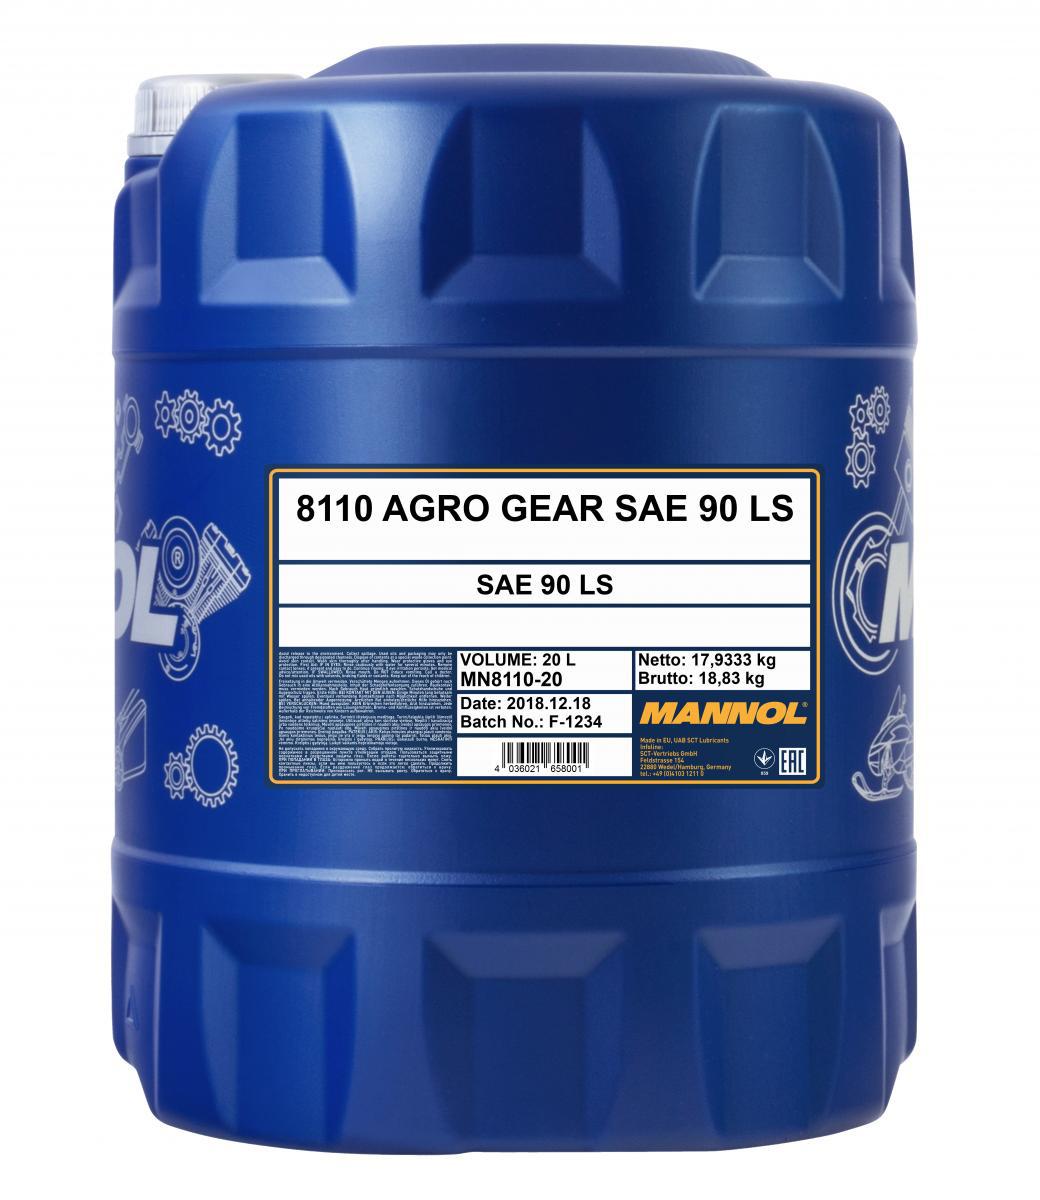 Agro Gear 90 LS